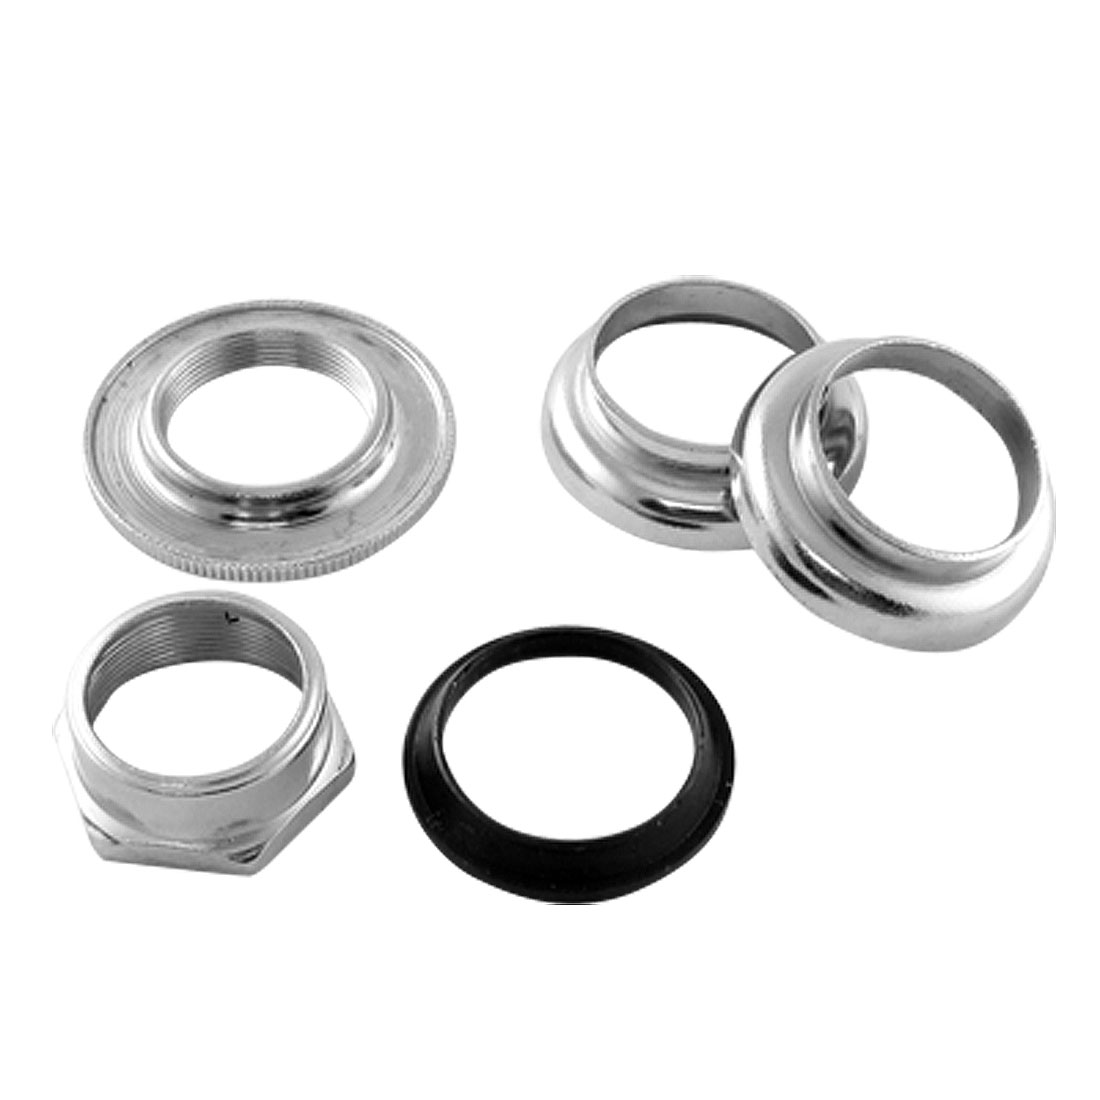 "Silver Tone Bicycle Bike 1"" Inner Diameter Head Set Parts"